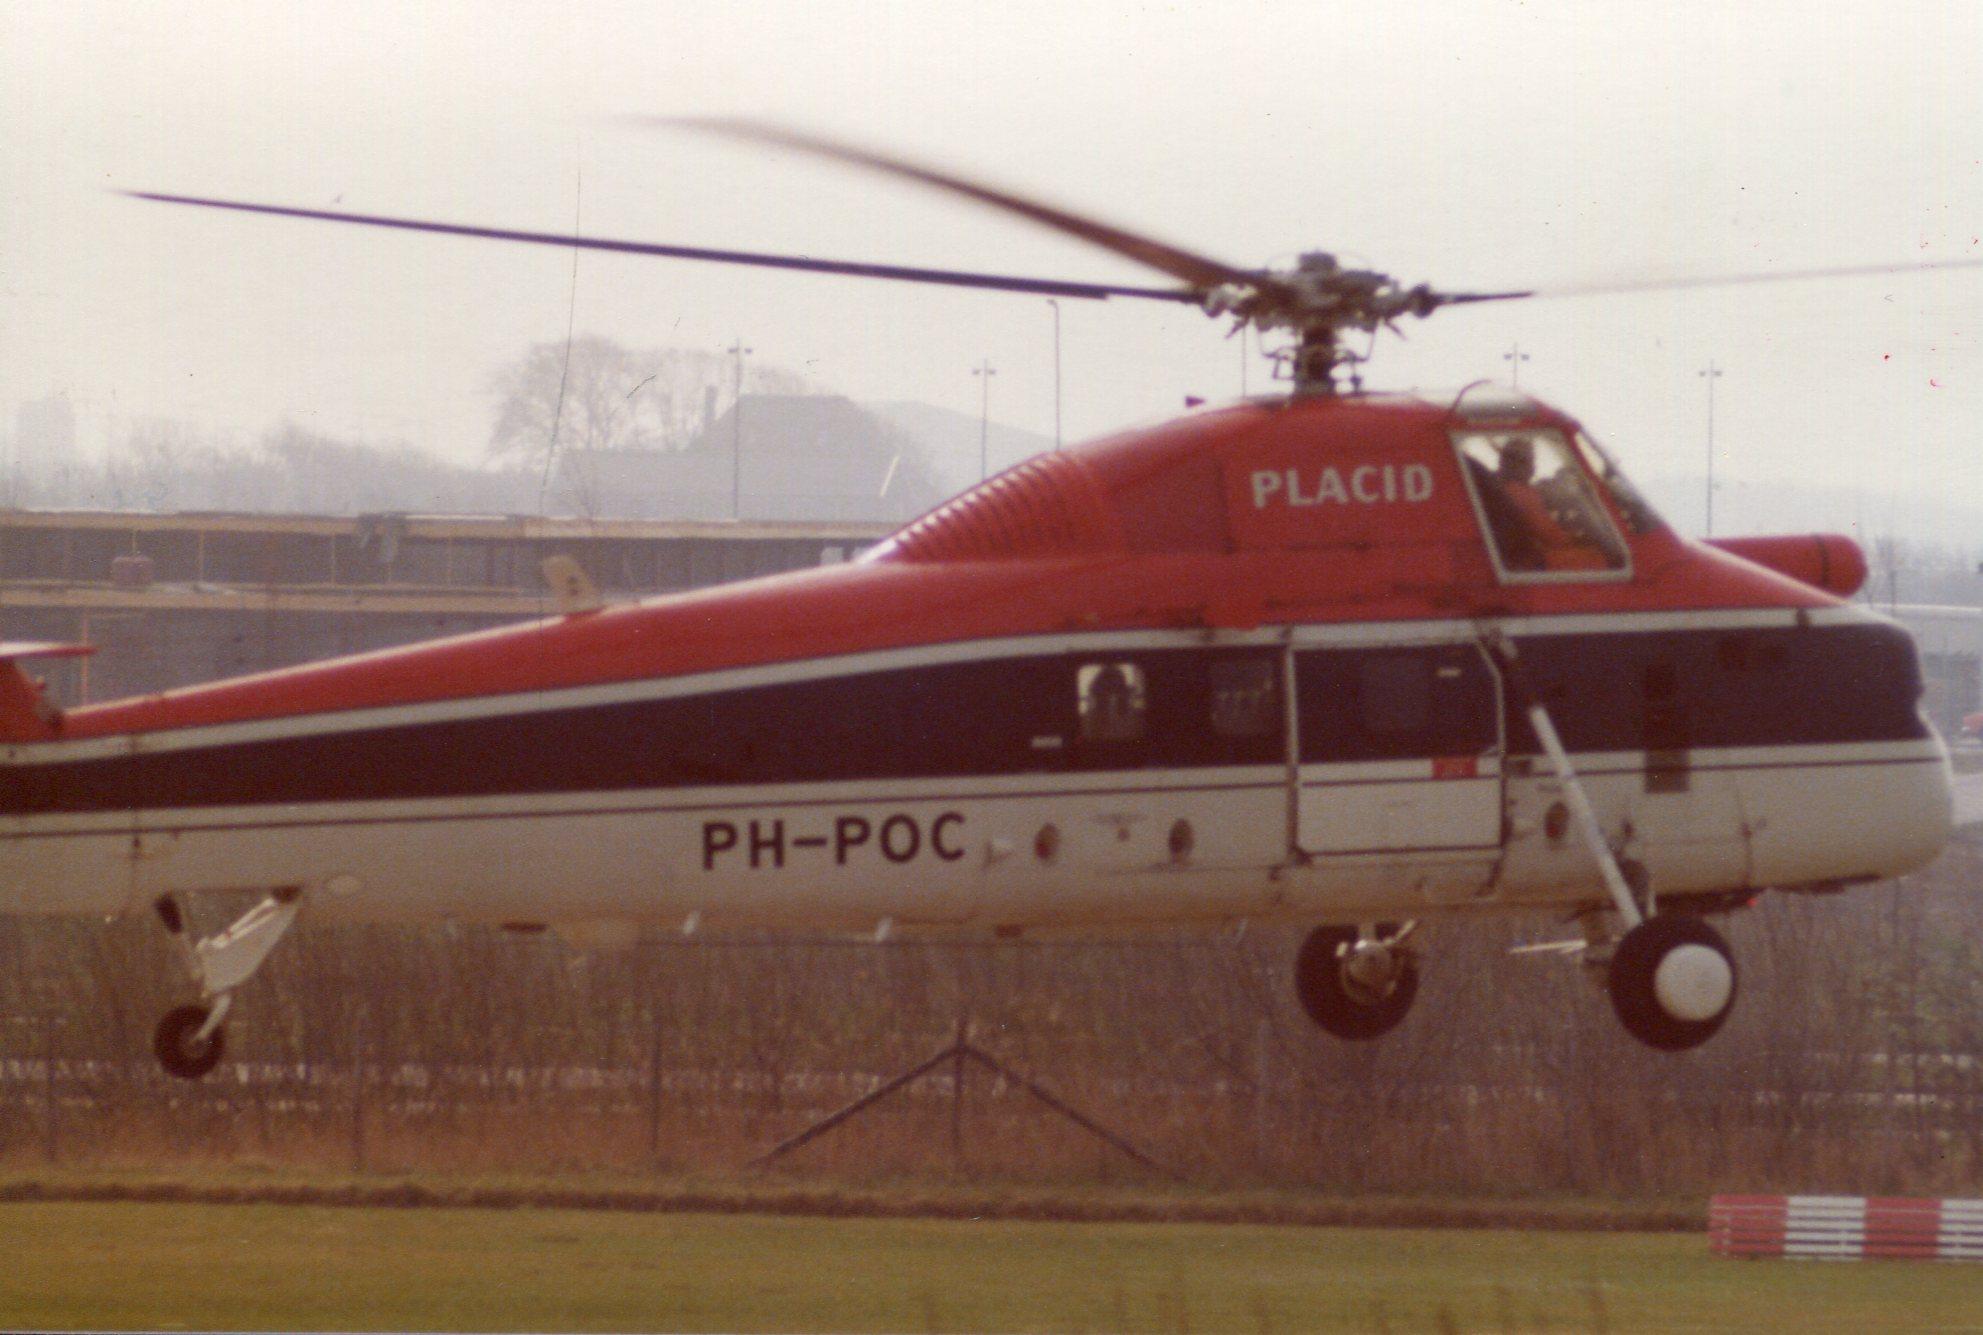 Naam: Den Helder , april 1977.jpg Bekeken: 512 Grootte: 279,4 KB